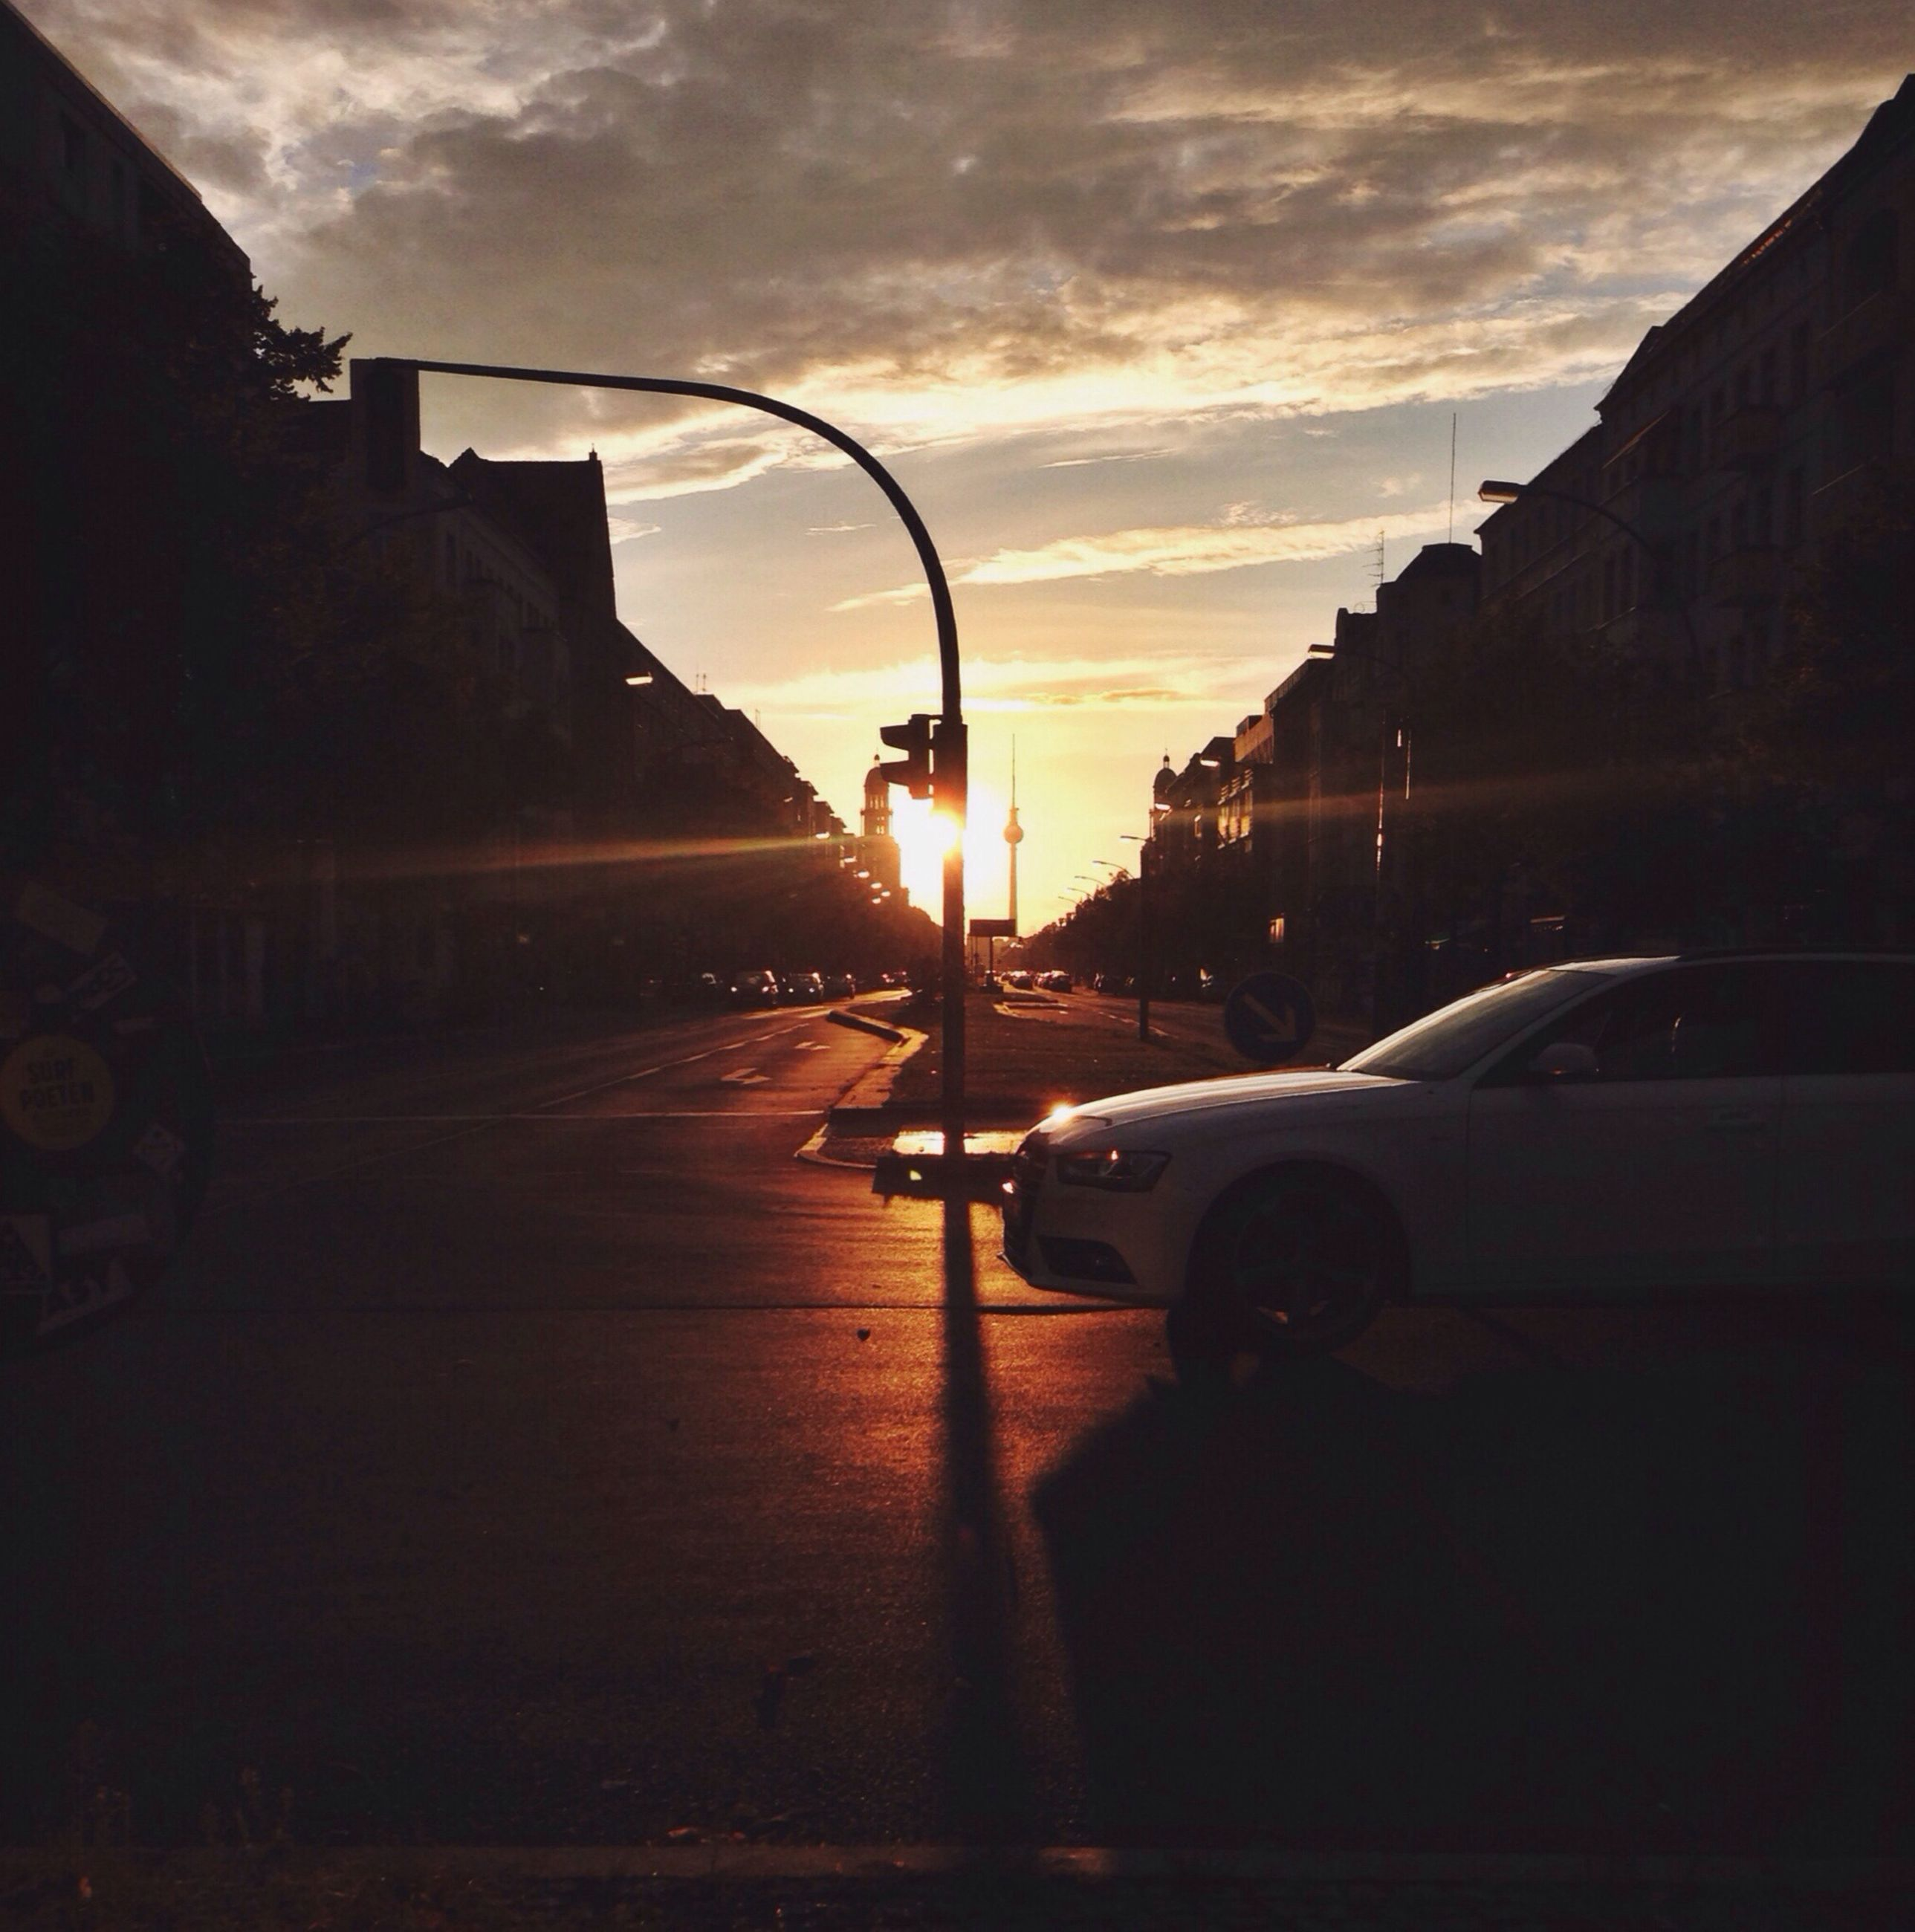 sky, transportation, sunset, mode of transport, building exterior, cloud - sky, built structure, architecture, land vehicle, car, street light, street, silhouette, cloud, sun, sunlight, cloudy, city, nautical vessel, dusk